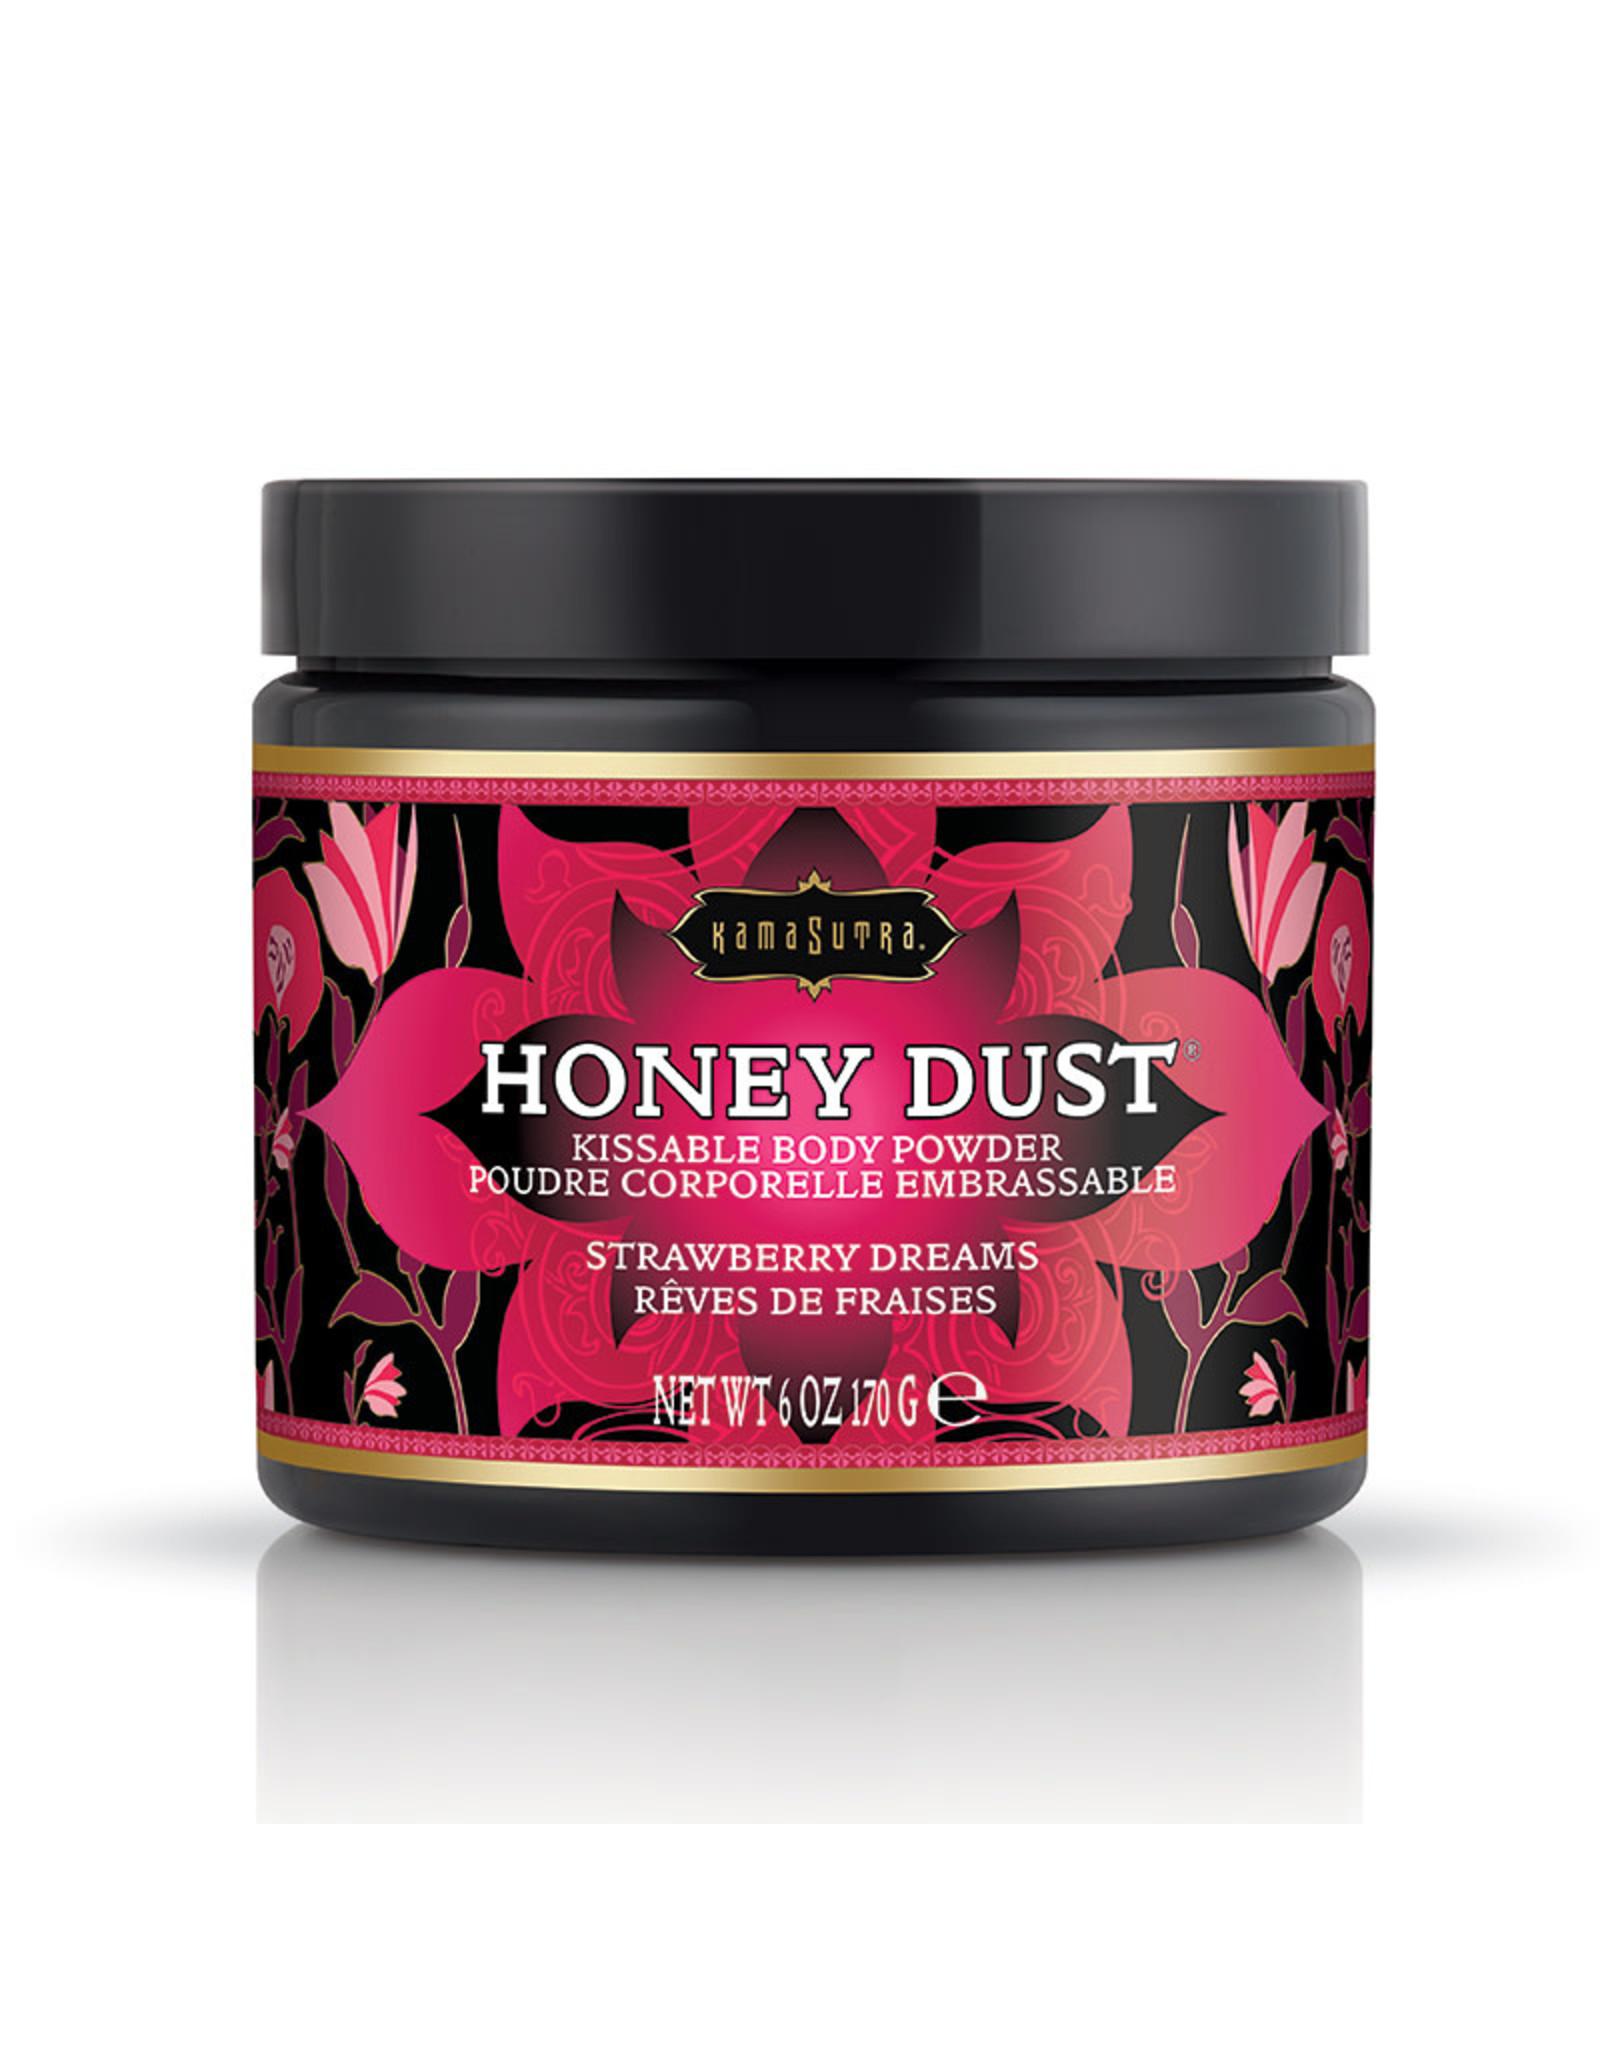 KamaSutra Honey Dust - Strawberry Dreams